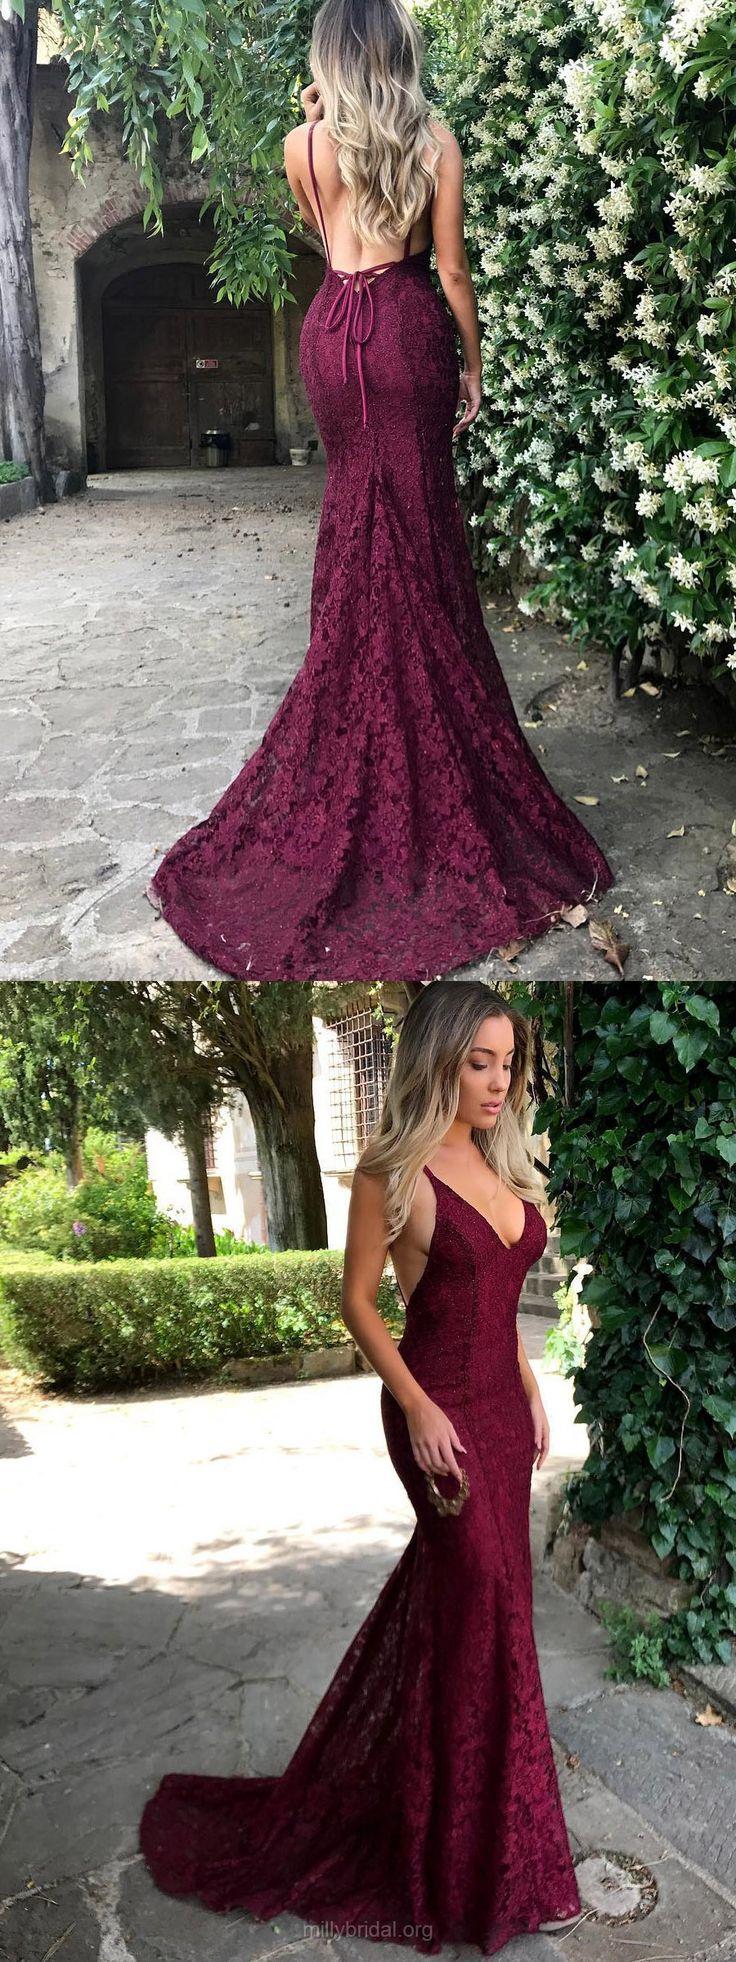 Long Prom Dresses, Lace Prom Dresses, 2018 Prom Dresses Trumpet/Mermaid, V-neck Prom Dresses For Teens, Sexy Prom Dresses For Girls #partydresses #evening